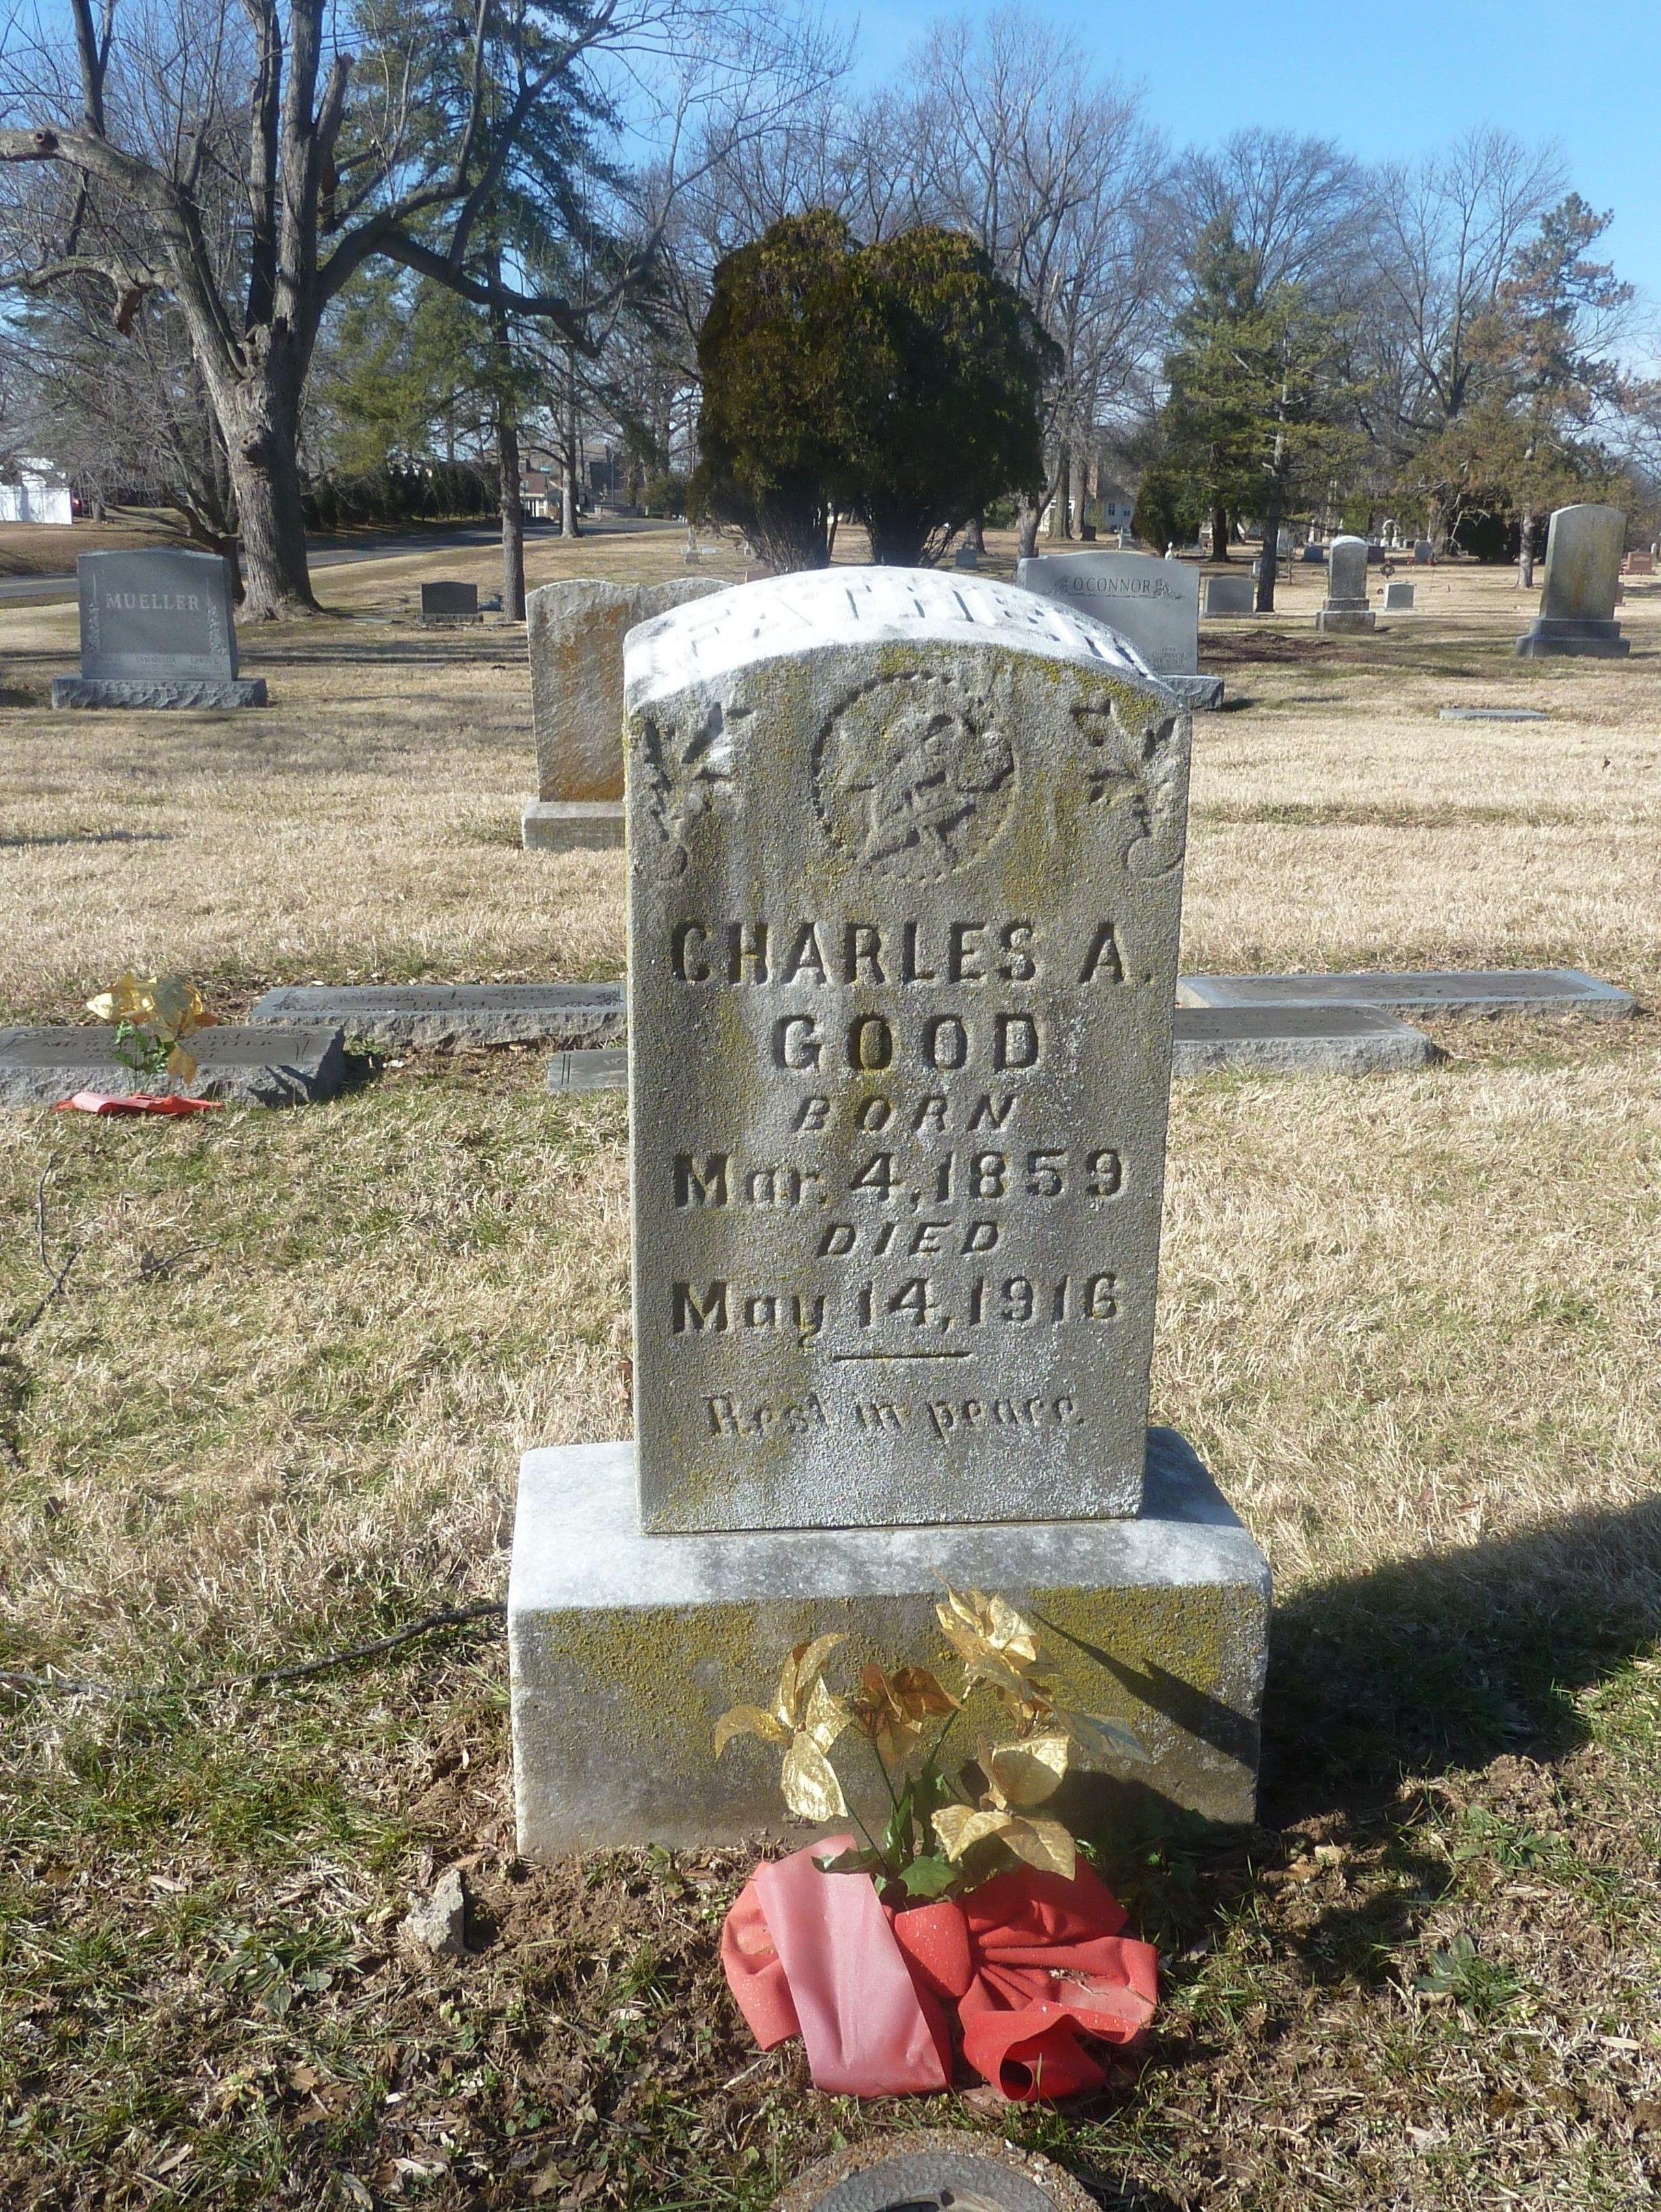 Charles A Good